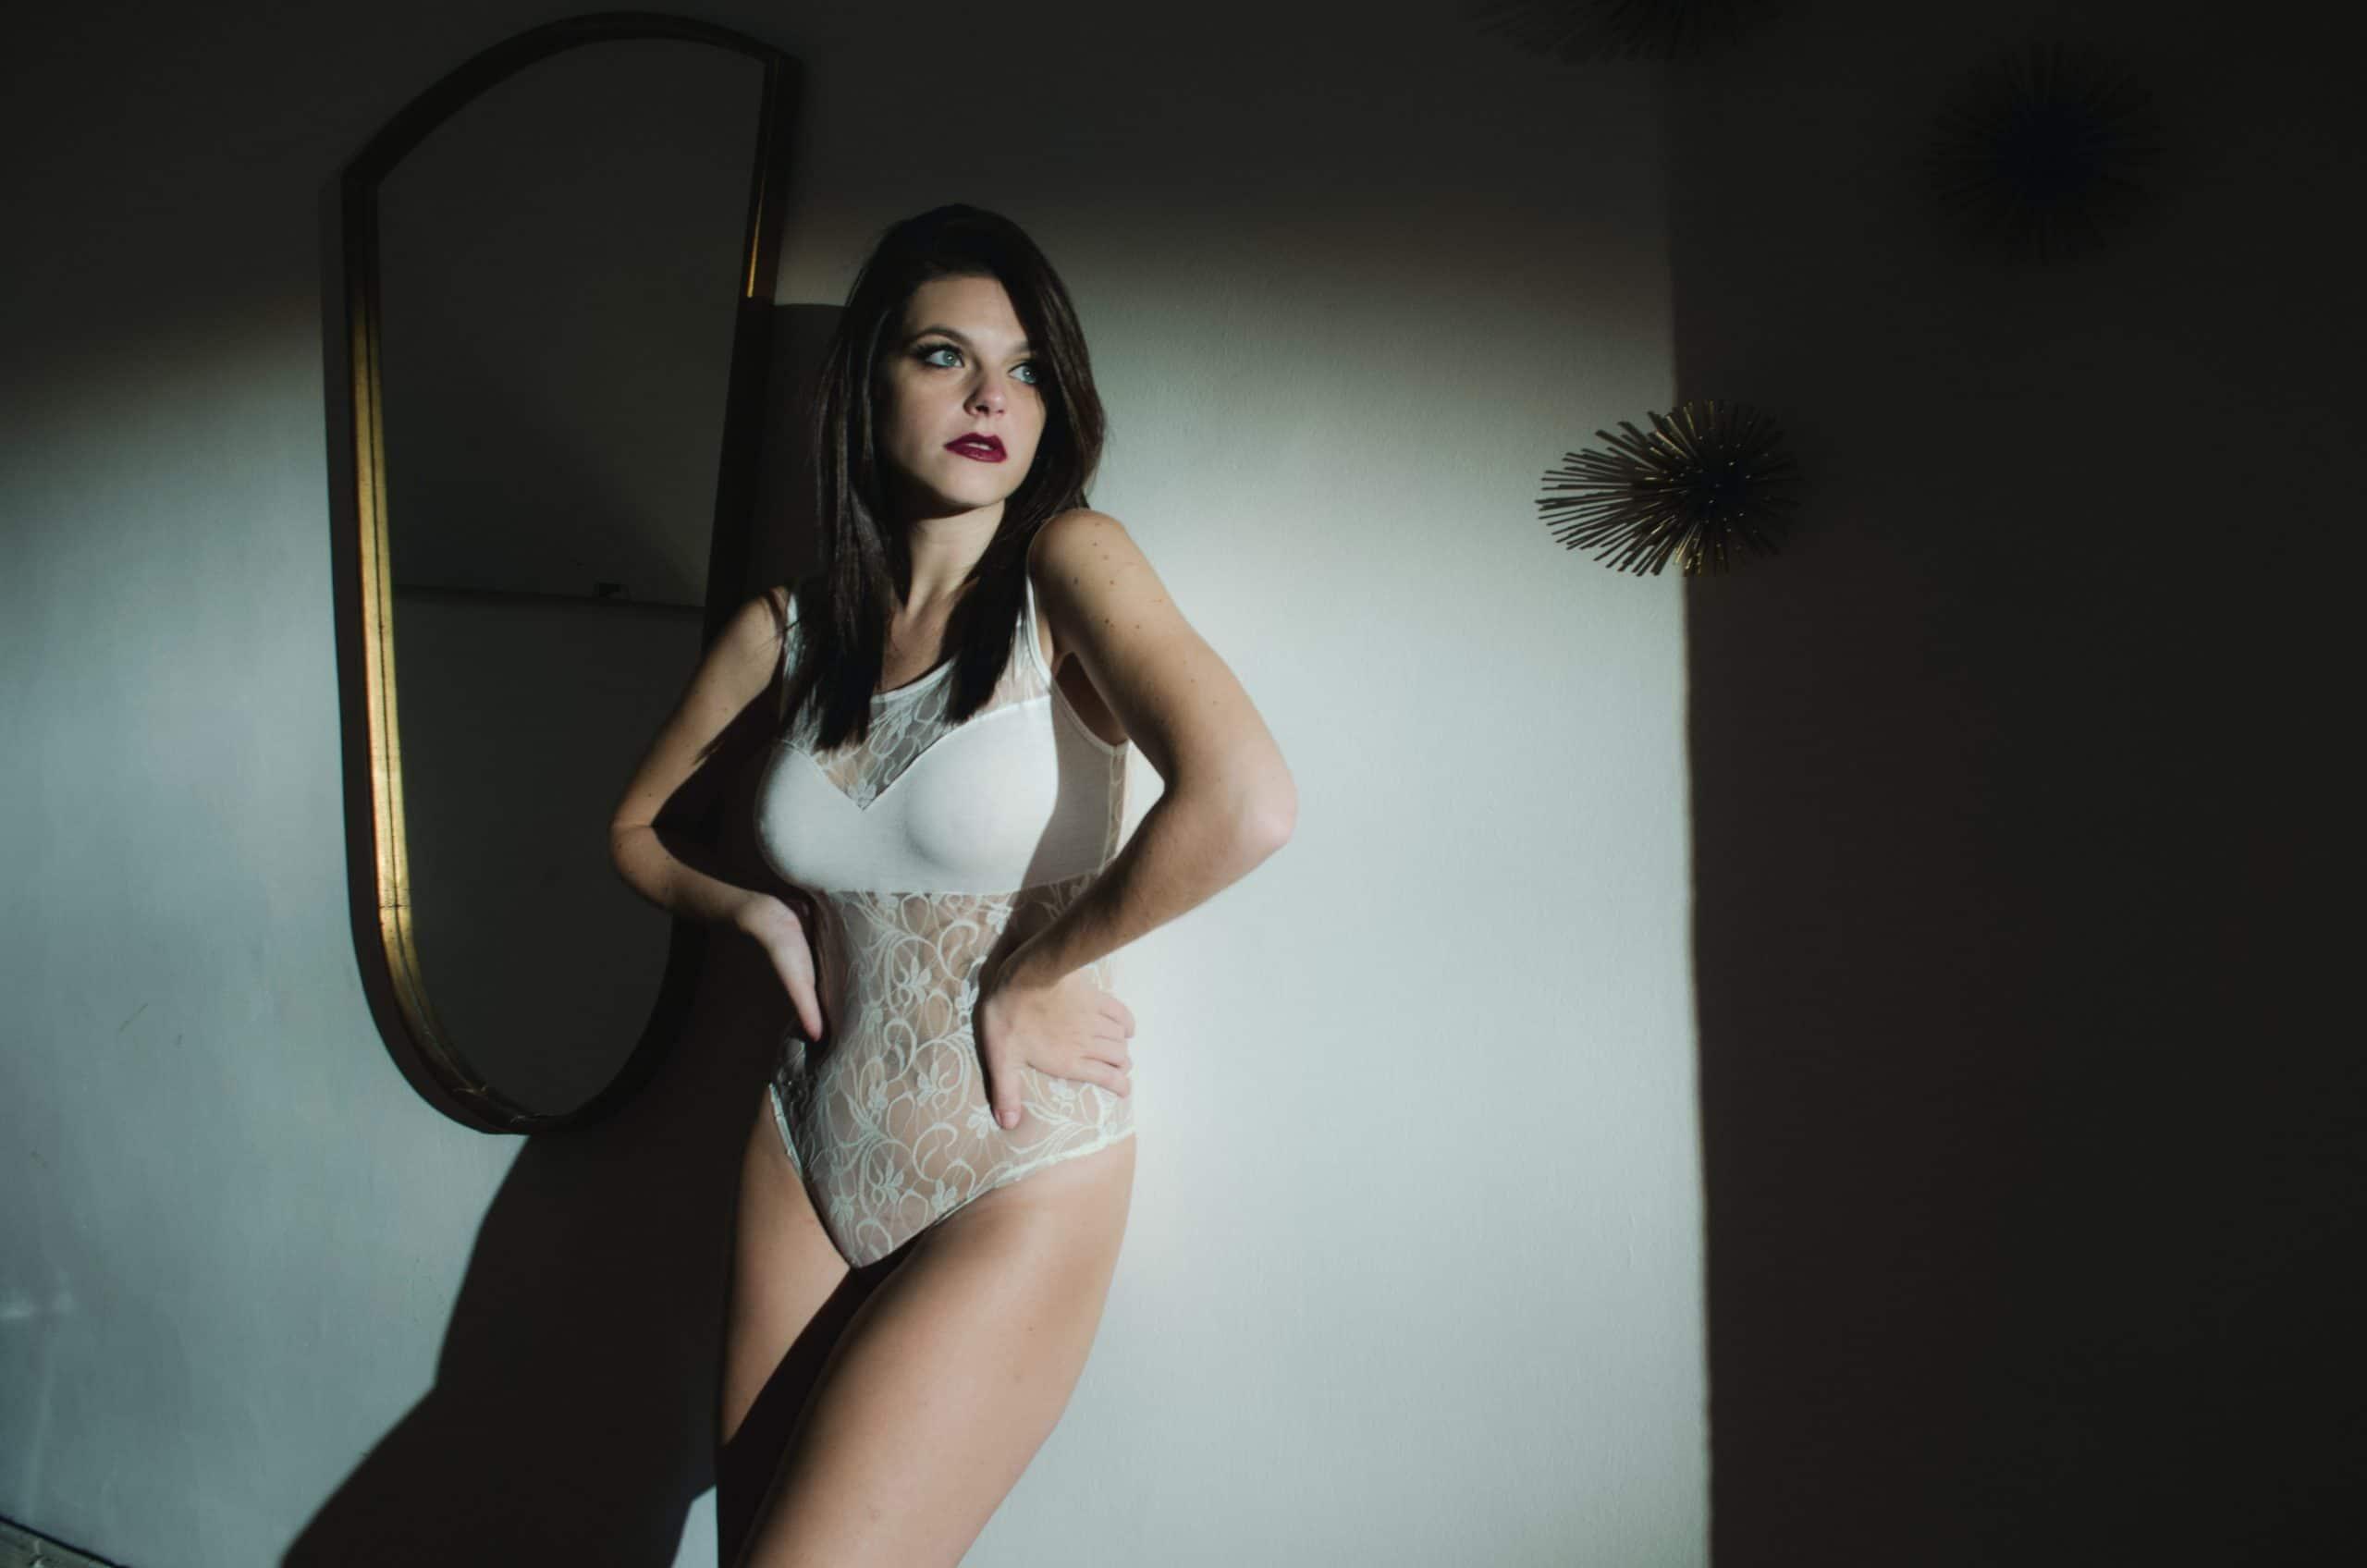 Femme en Body String gainant blanc